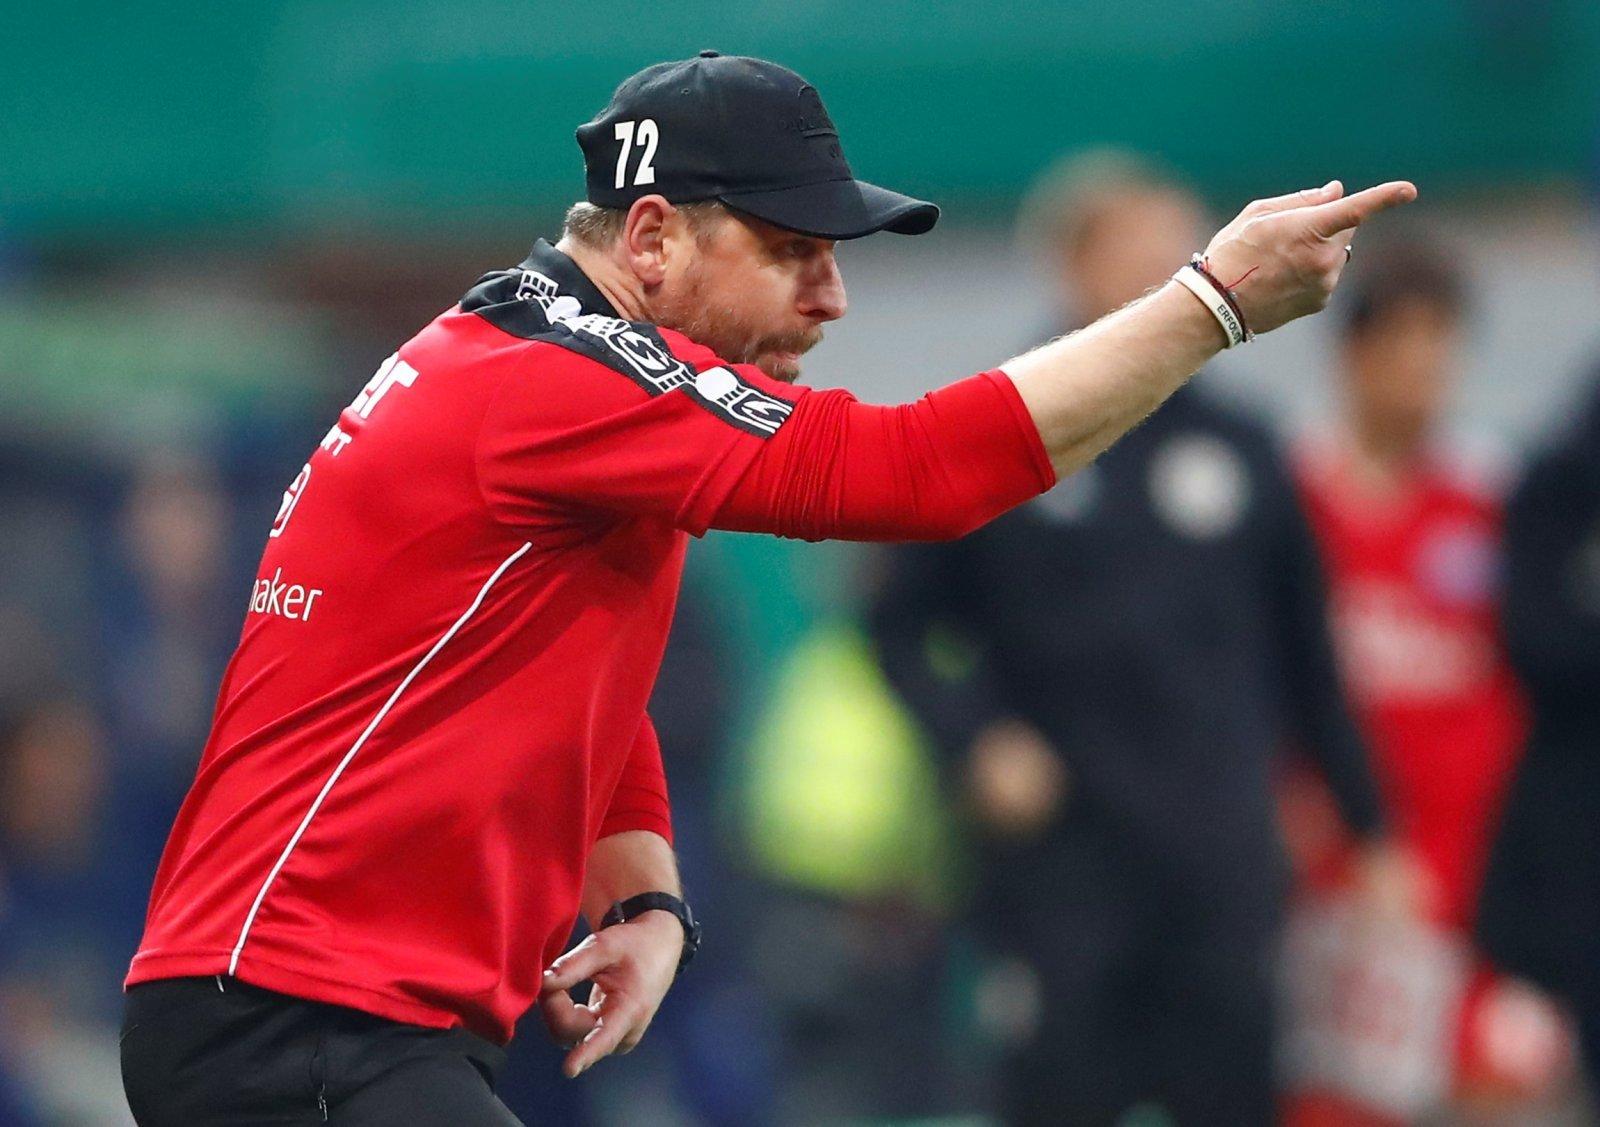 SC Paderborn coach Steffen Baumgart